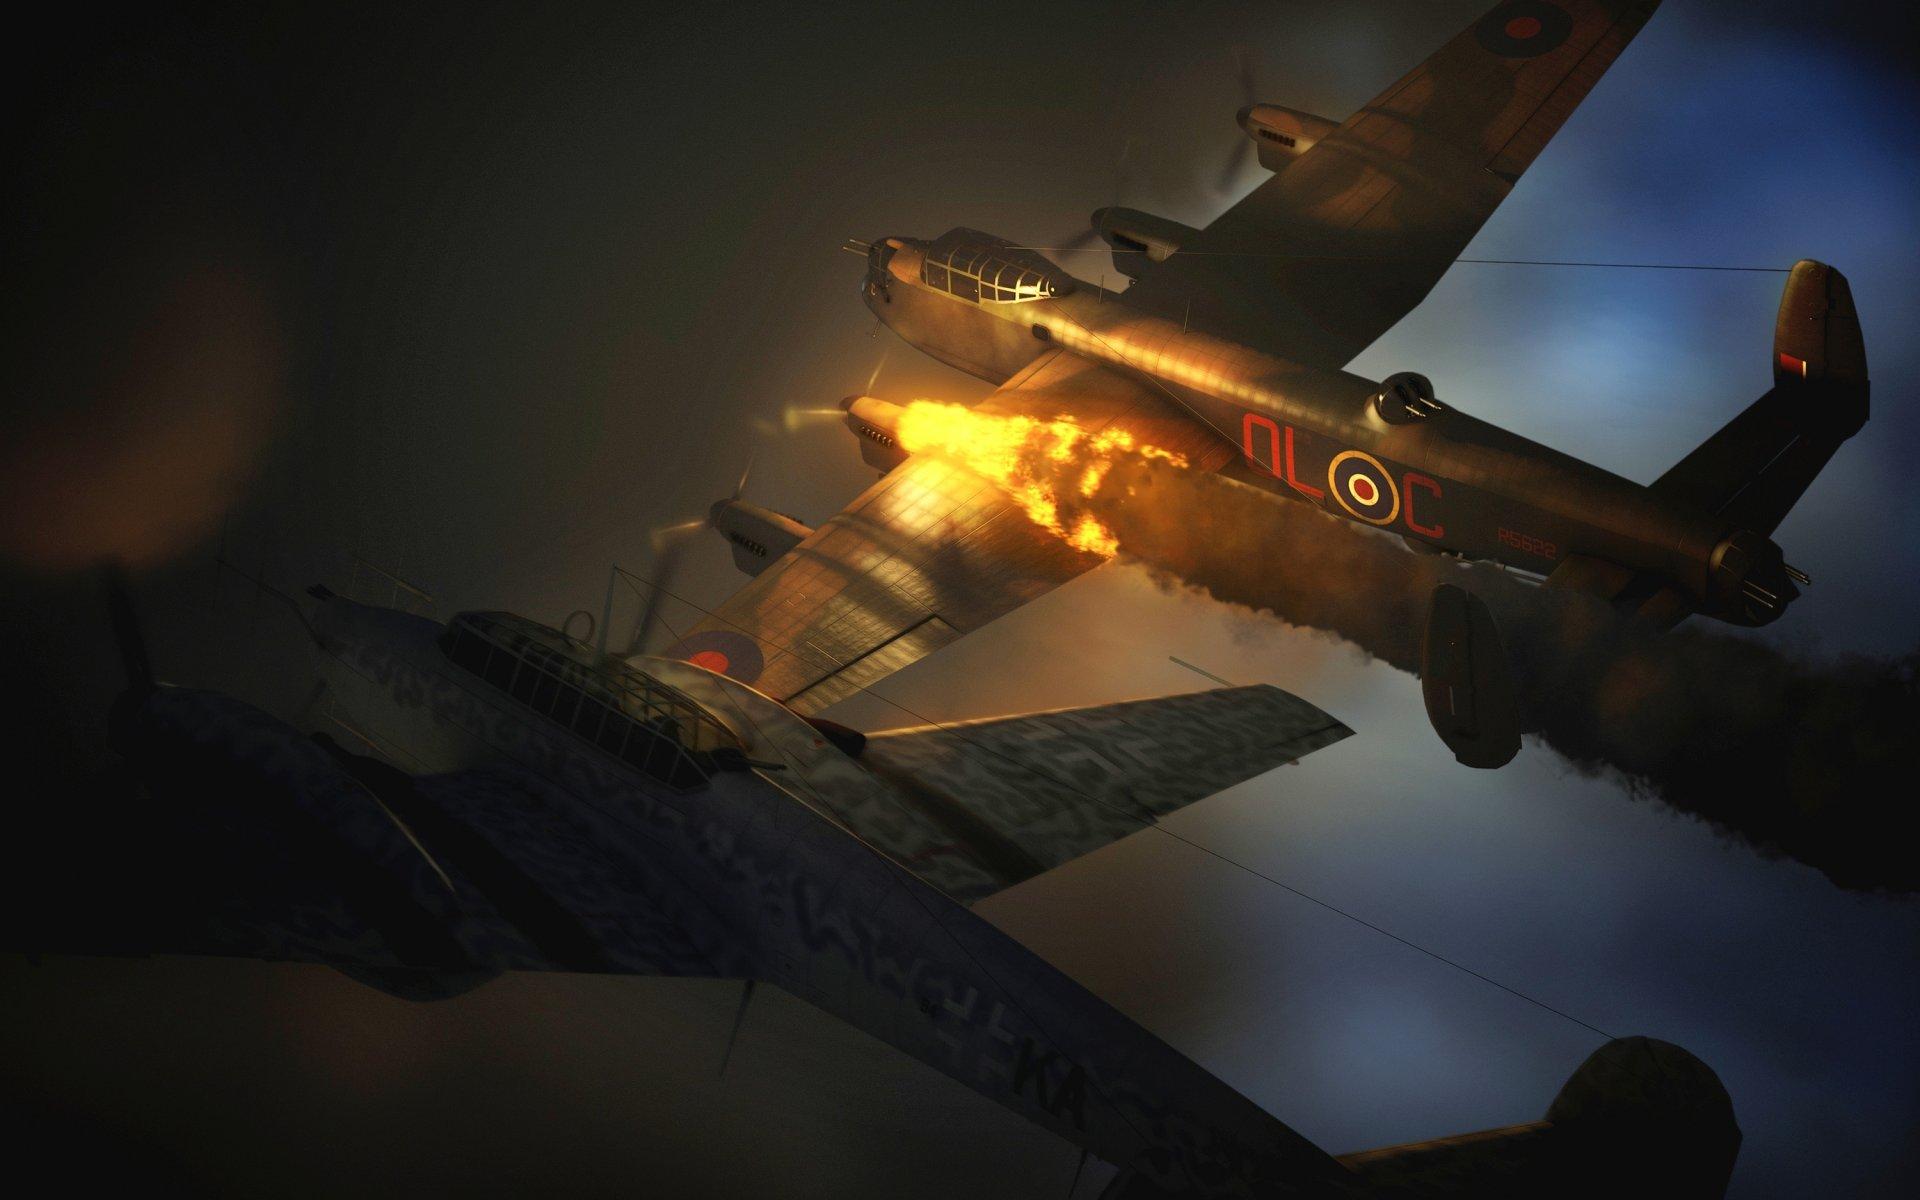 Обои avro lancaster, бомбардировщик, четырёхмоторный. Авиация foto 17